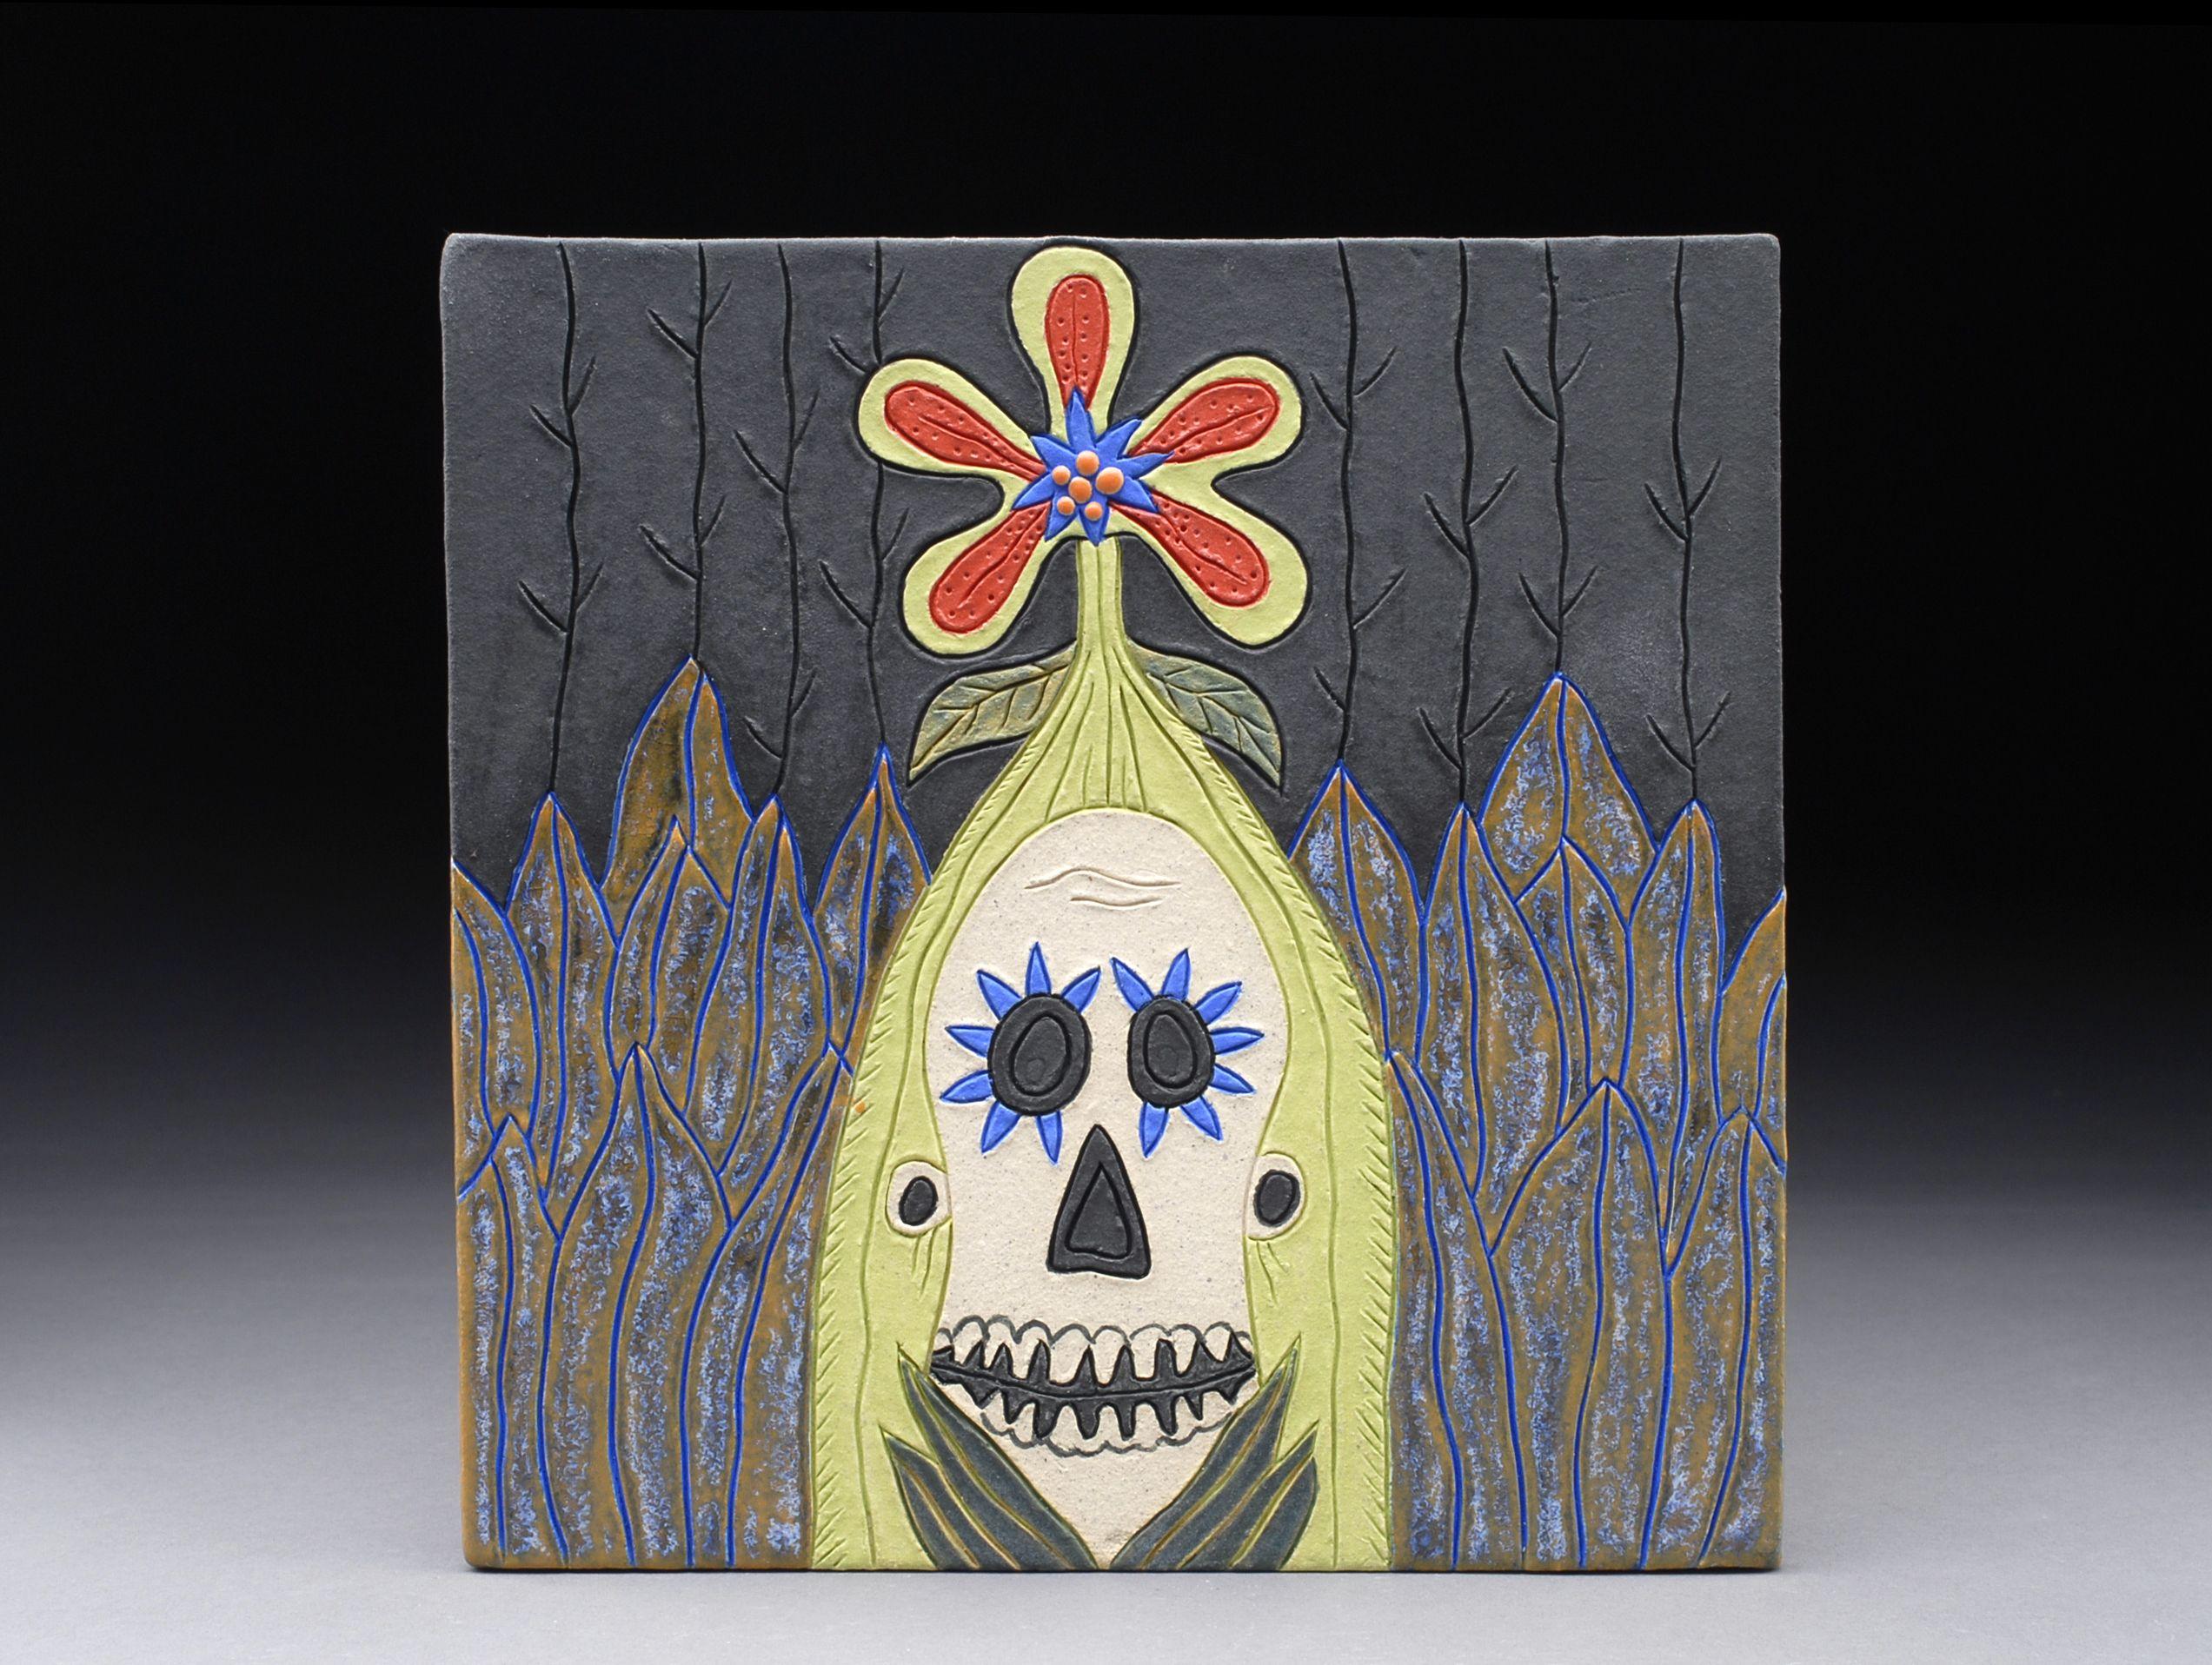 Blooming skull 2 8 x 8 ceramic tile ceramic techniques blooming skull 2 8 x 8 ceramic tile dailygadgetfo Choice Image